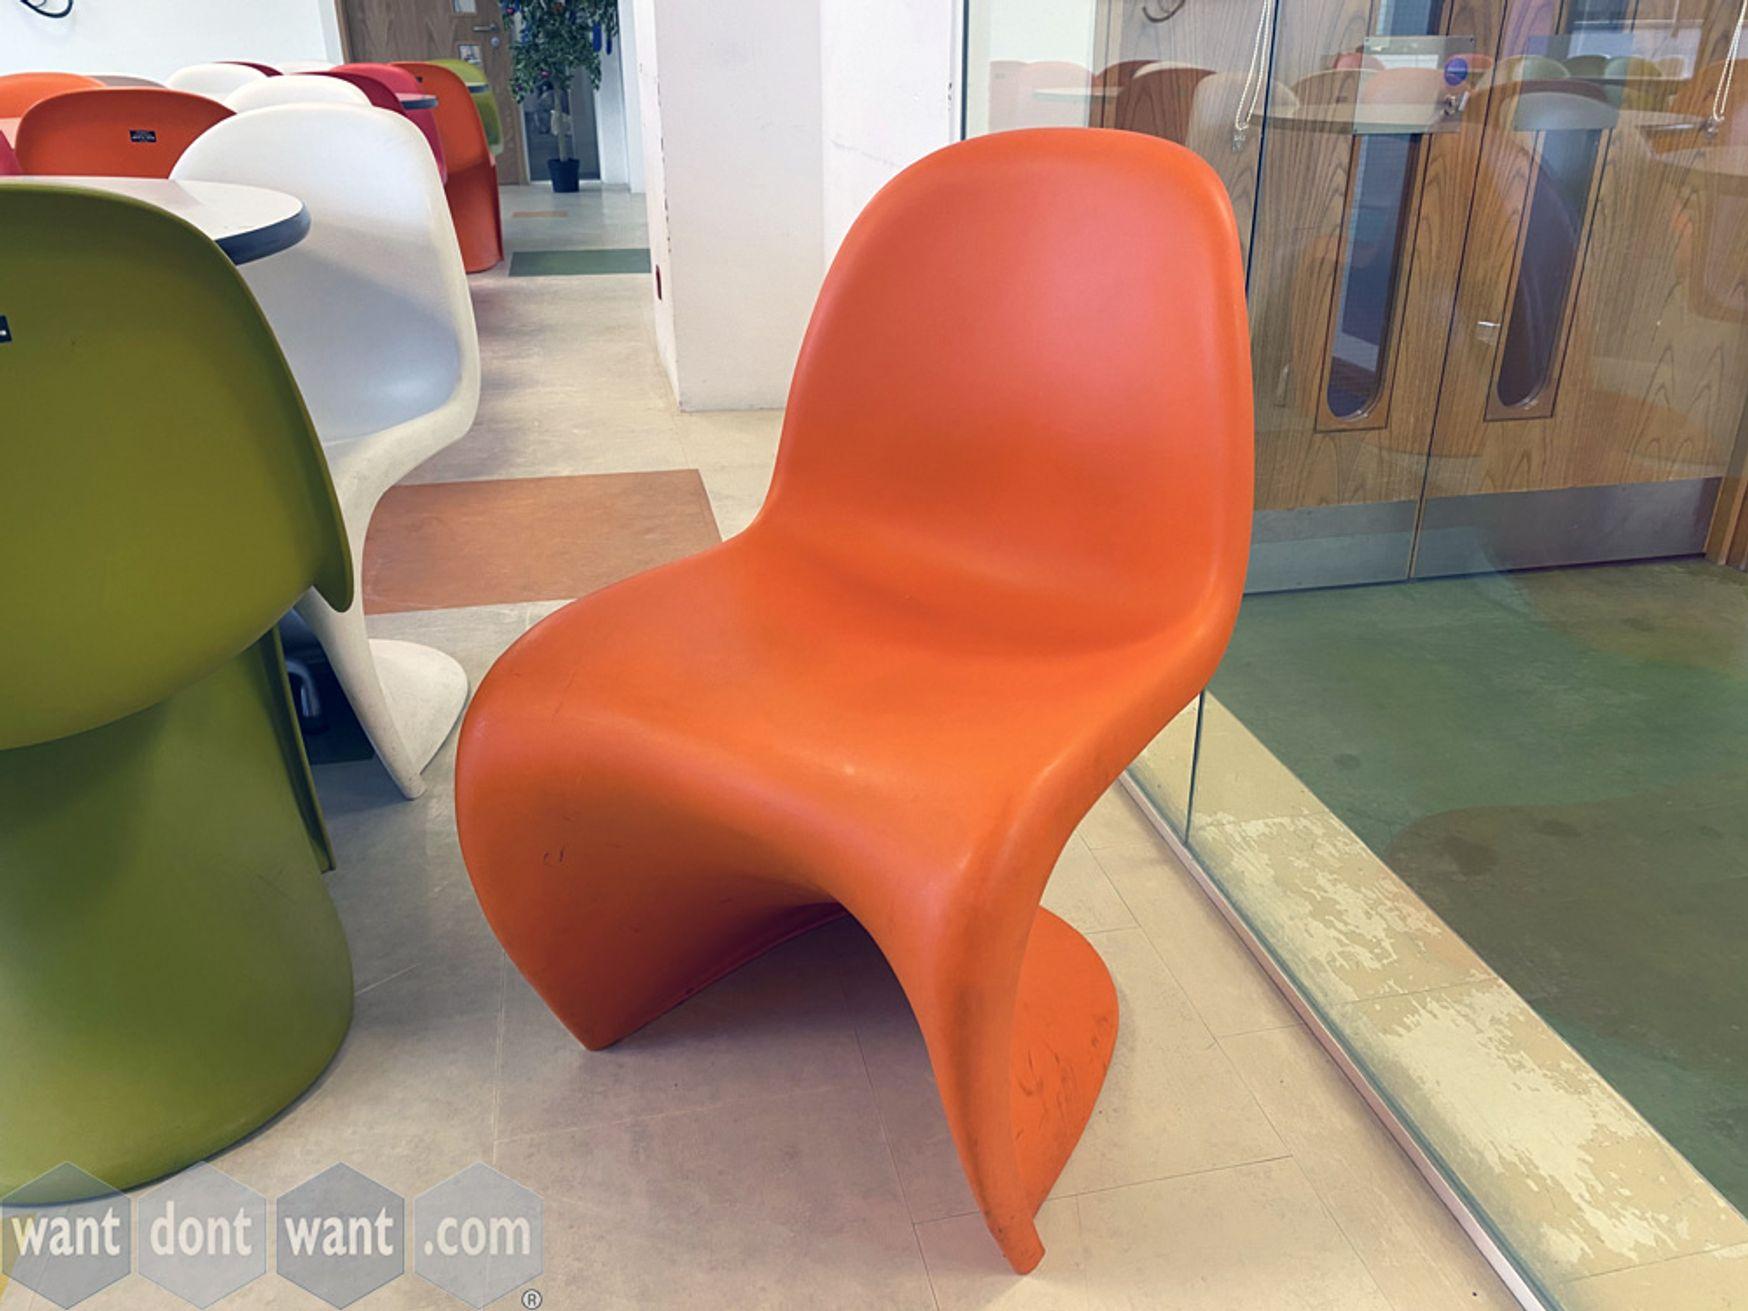 Used iconic design Vitra 'Panton' chairs in orange.